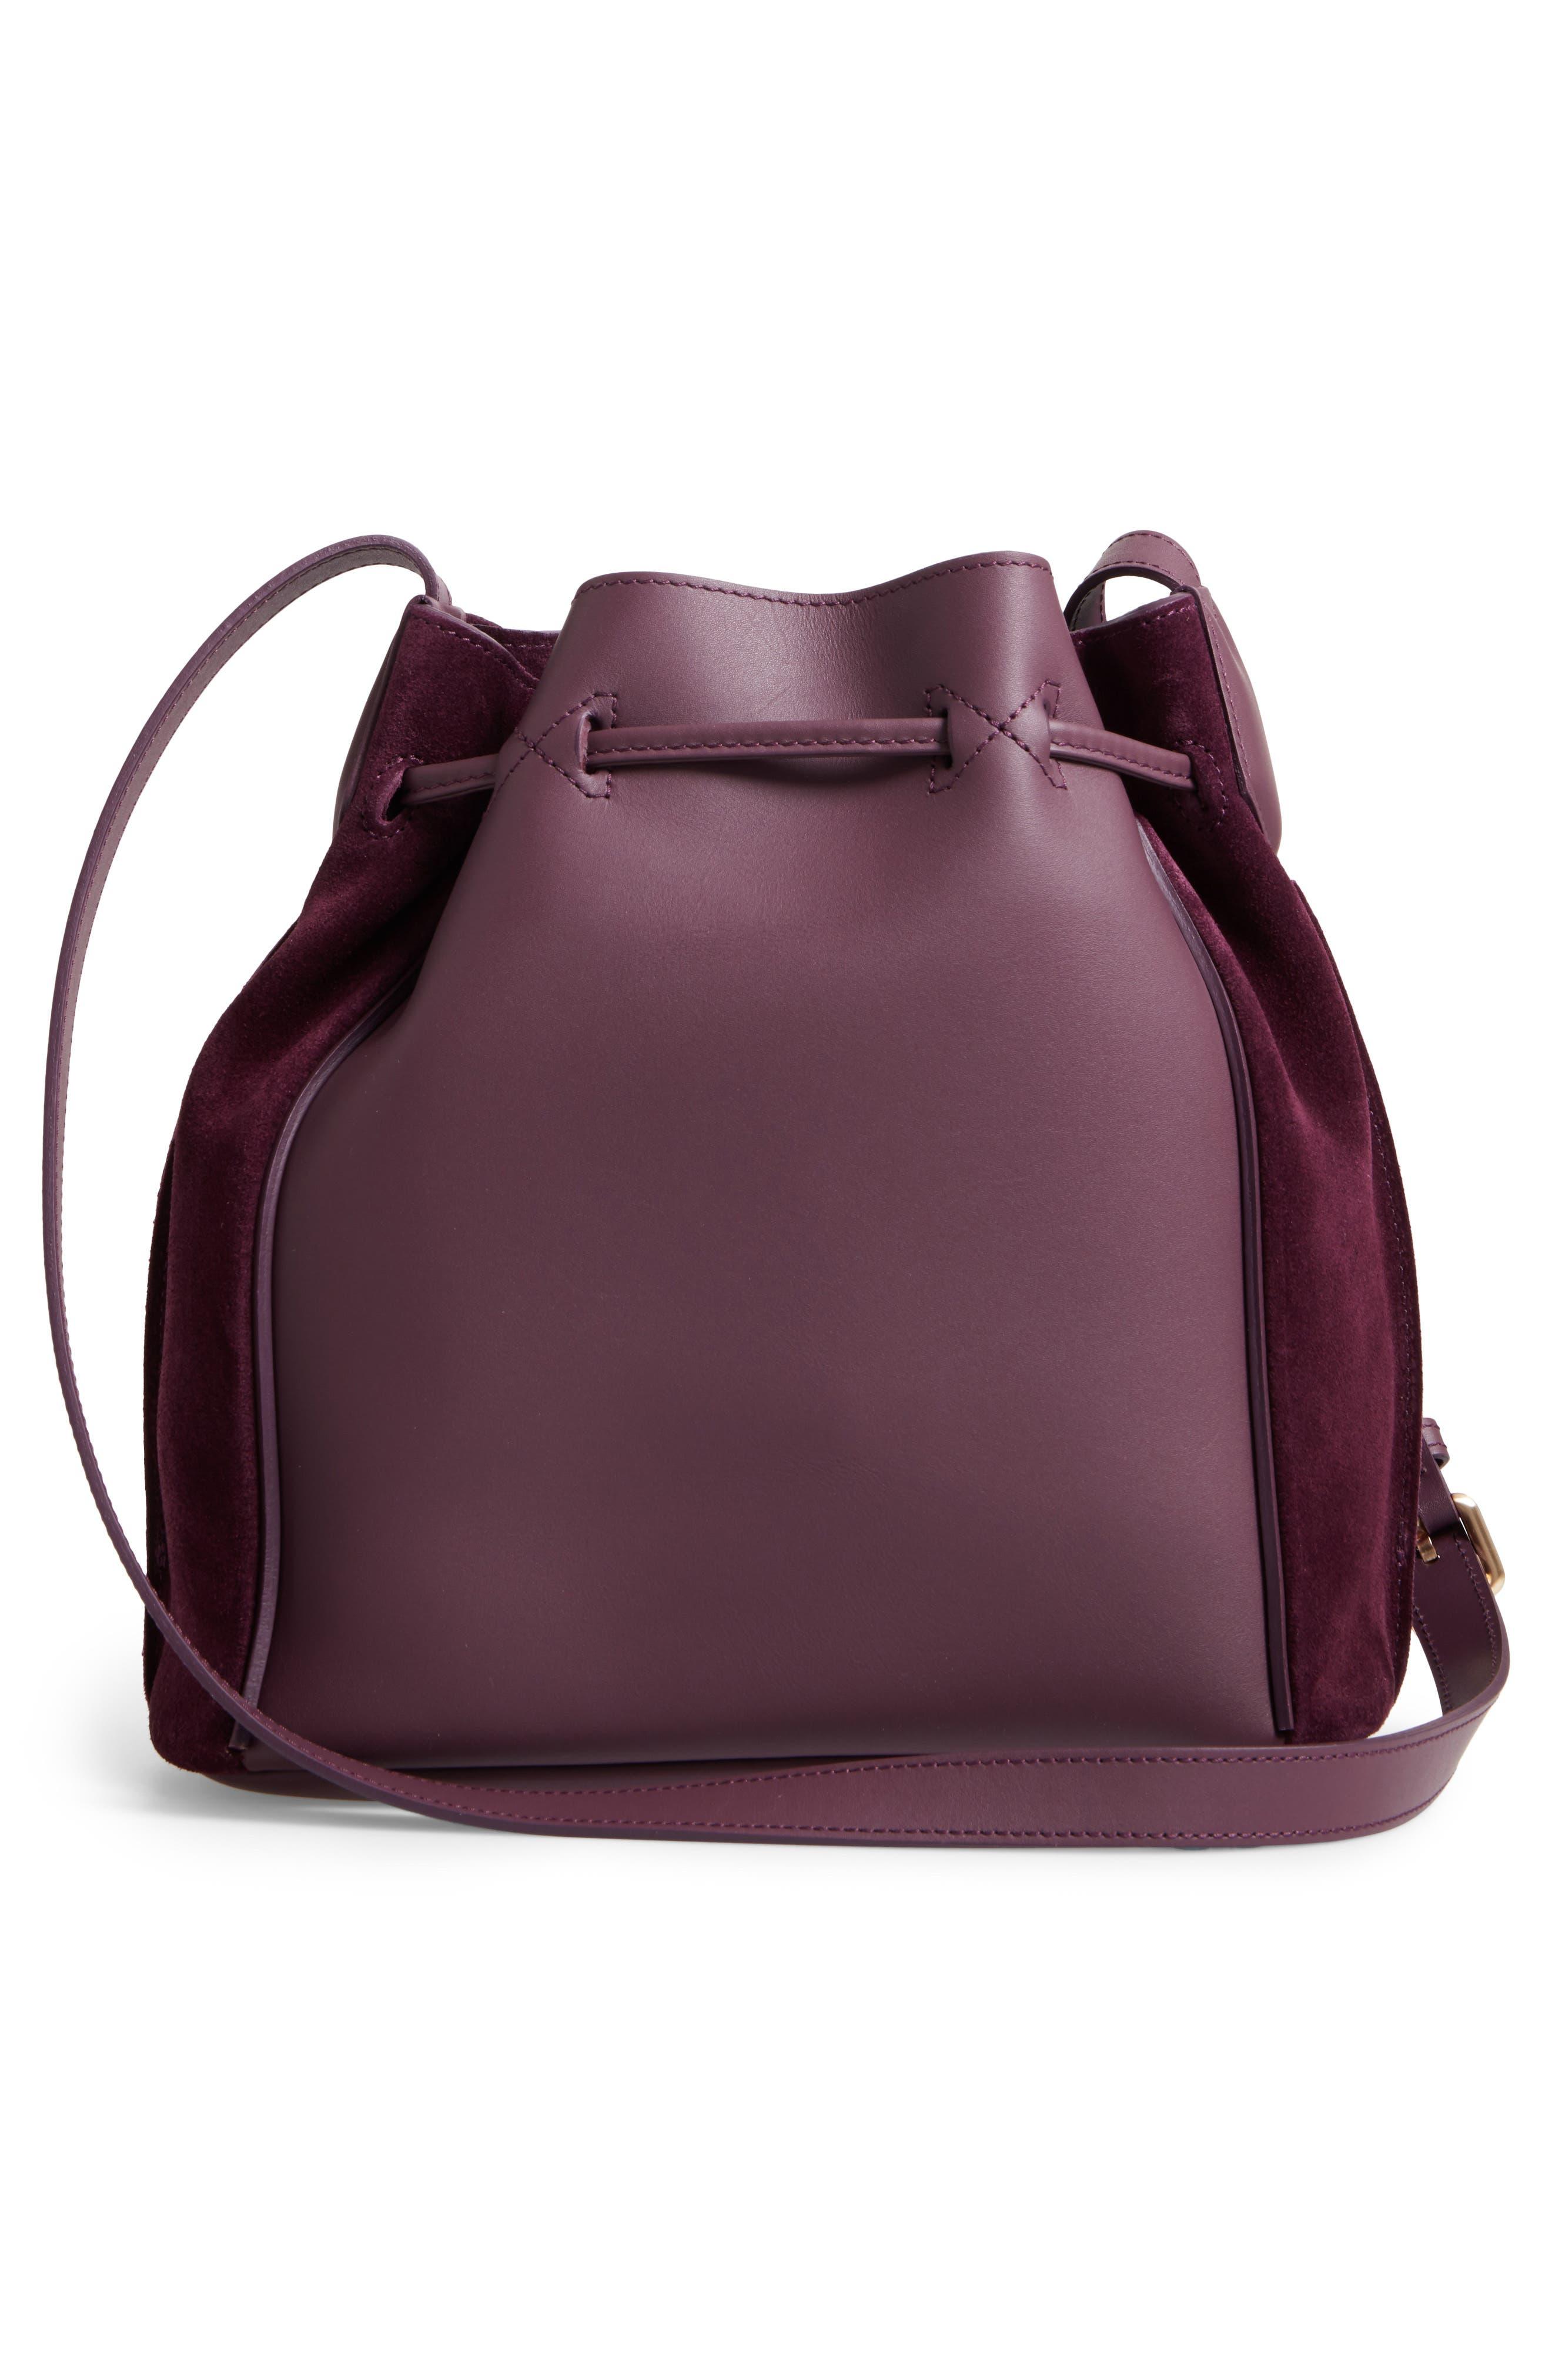 Penelope Fantasie Leather Bucket Bag,                             Alternate thumbnail 7, color,